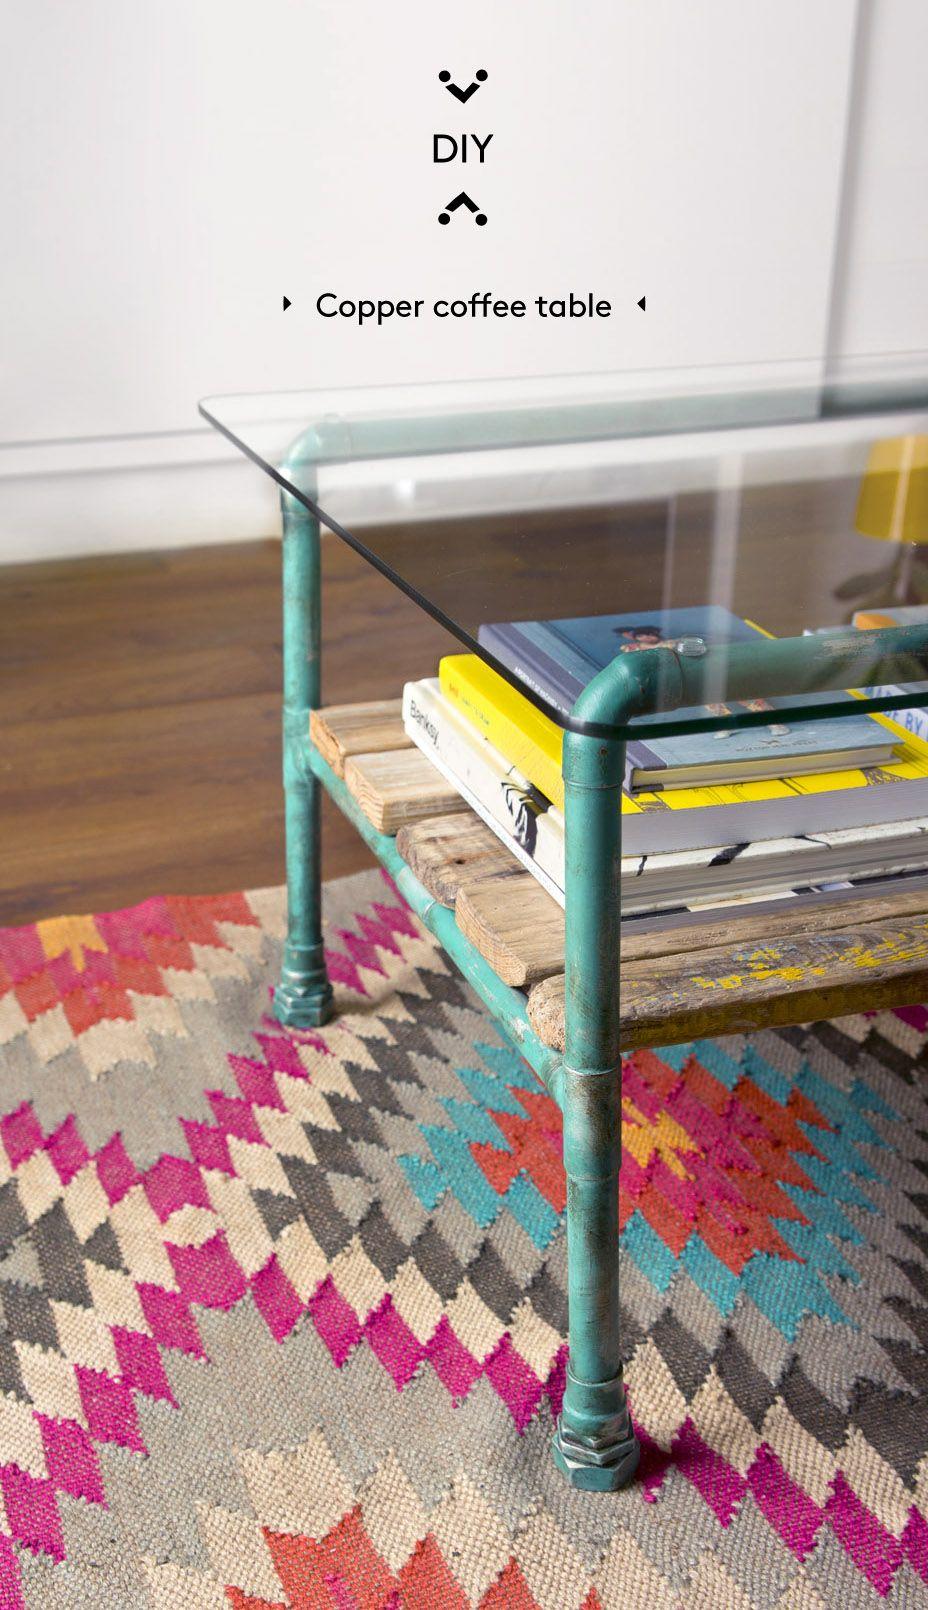 DIY copper pipe coffee table · DIY mesa de centro con tubos de cobre ...